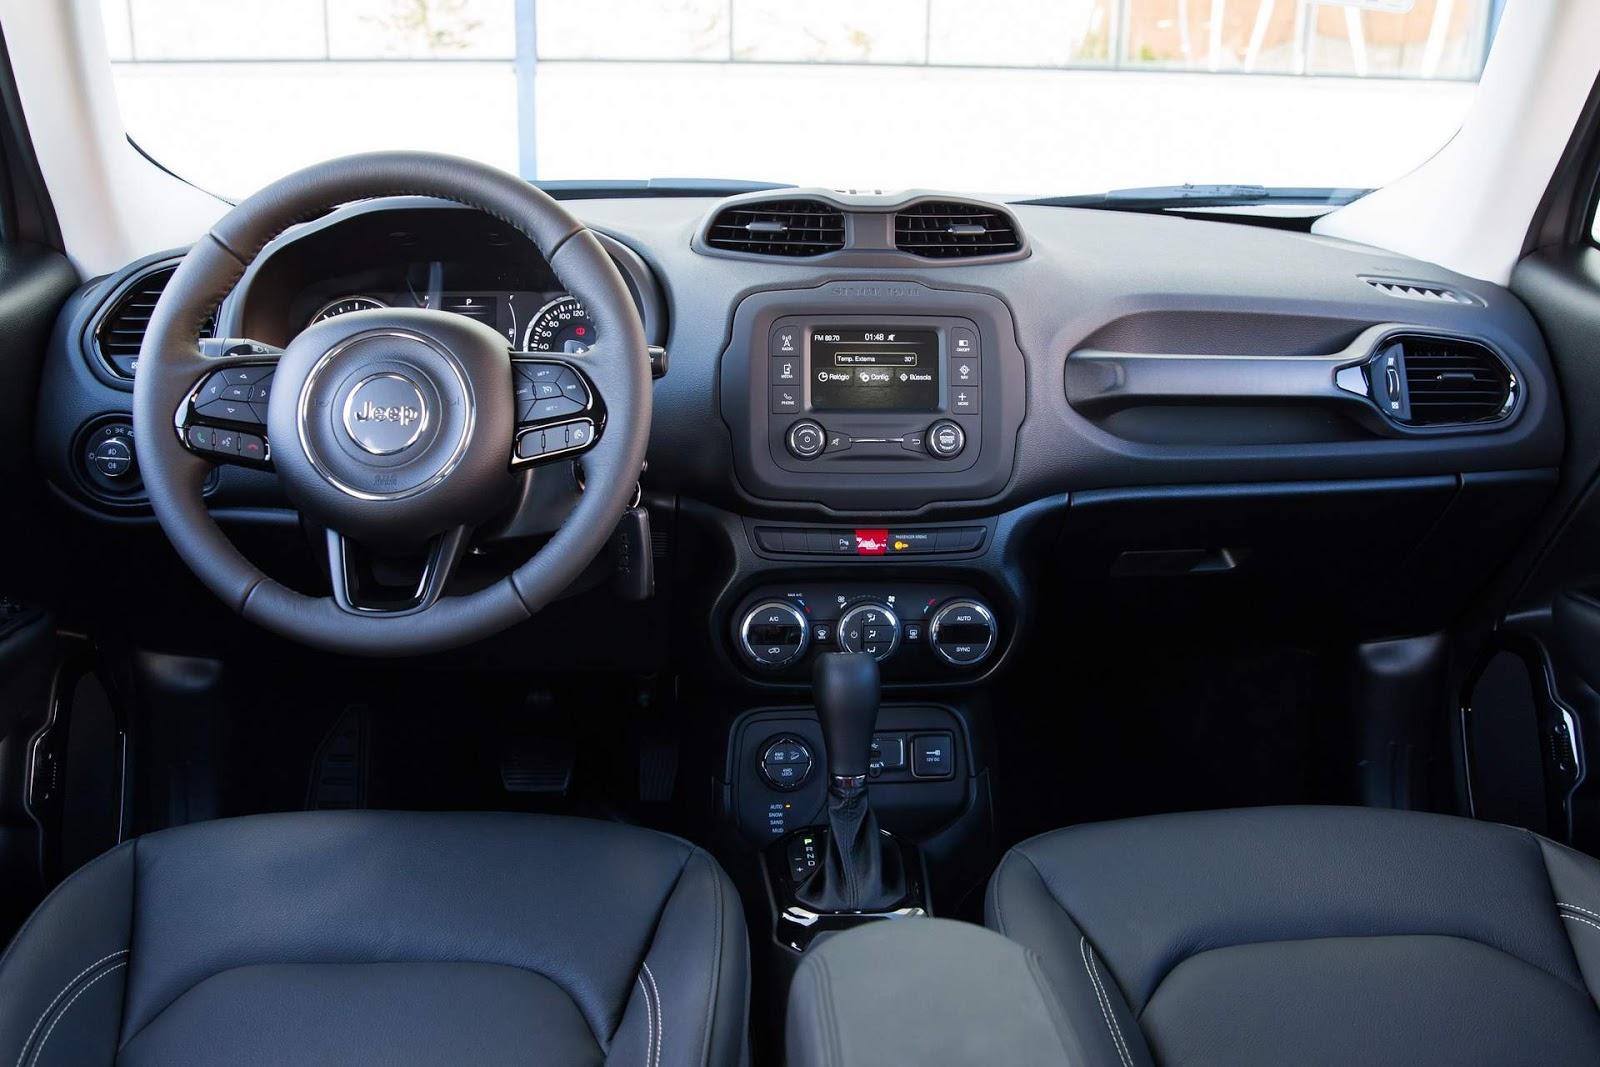 Jeep renegade 2018 fotos vers es pre os e consumo car for Interior jeep renegade